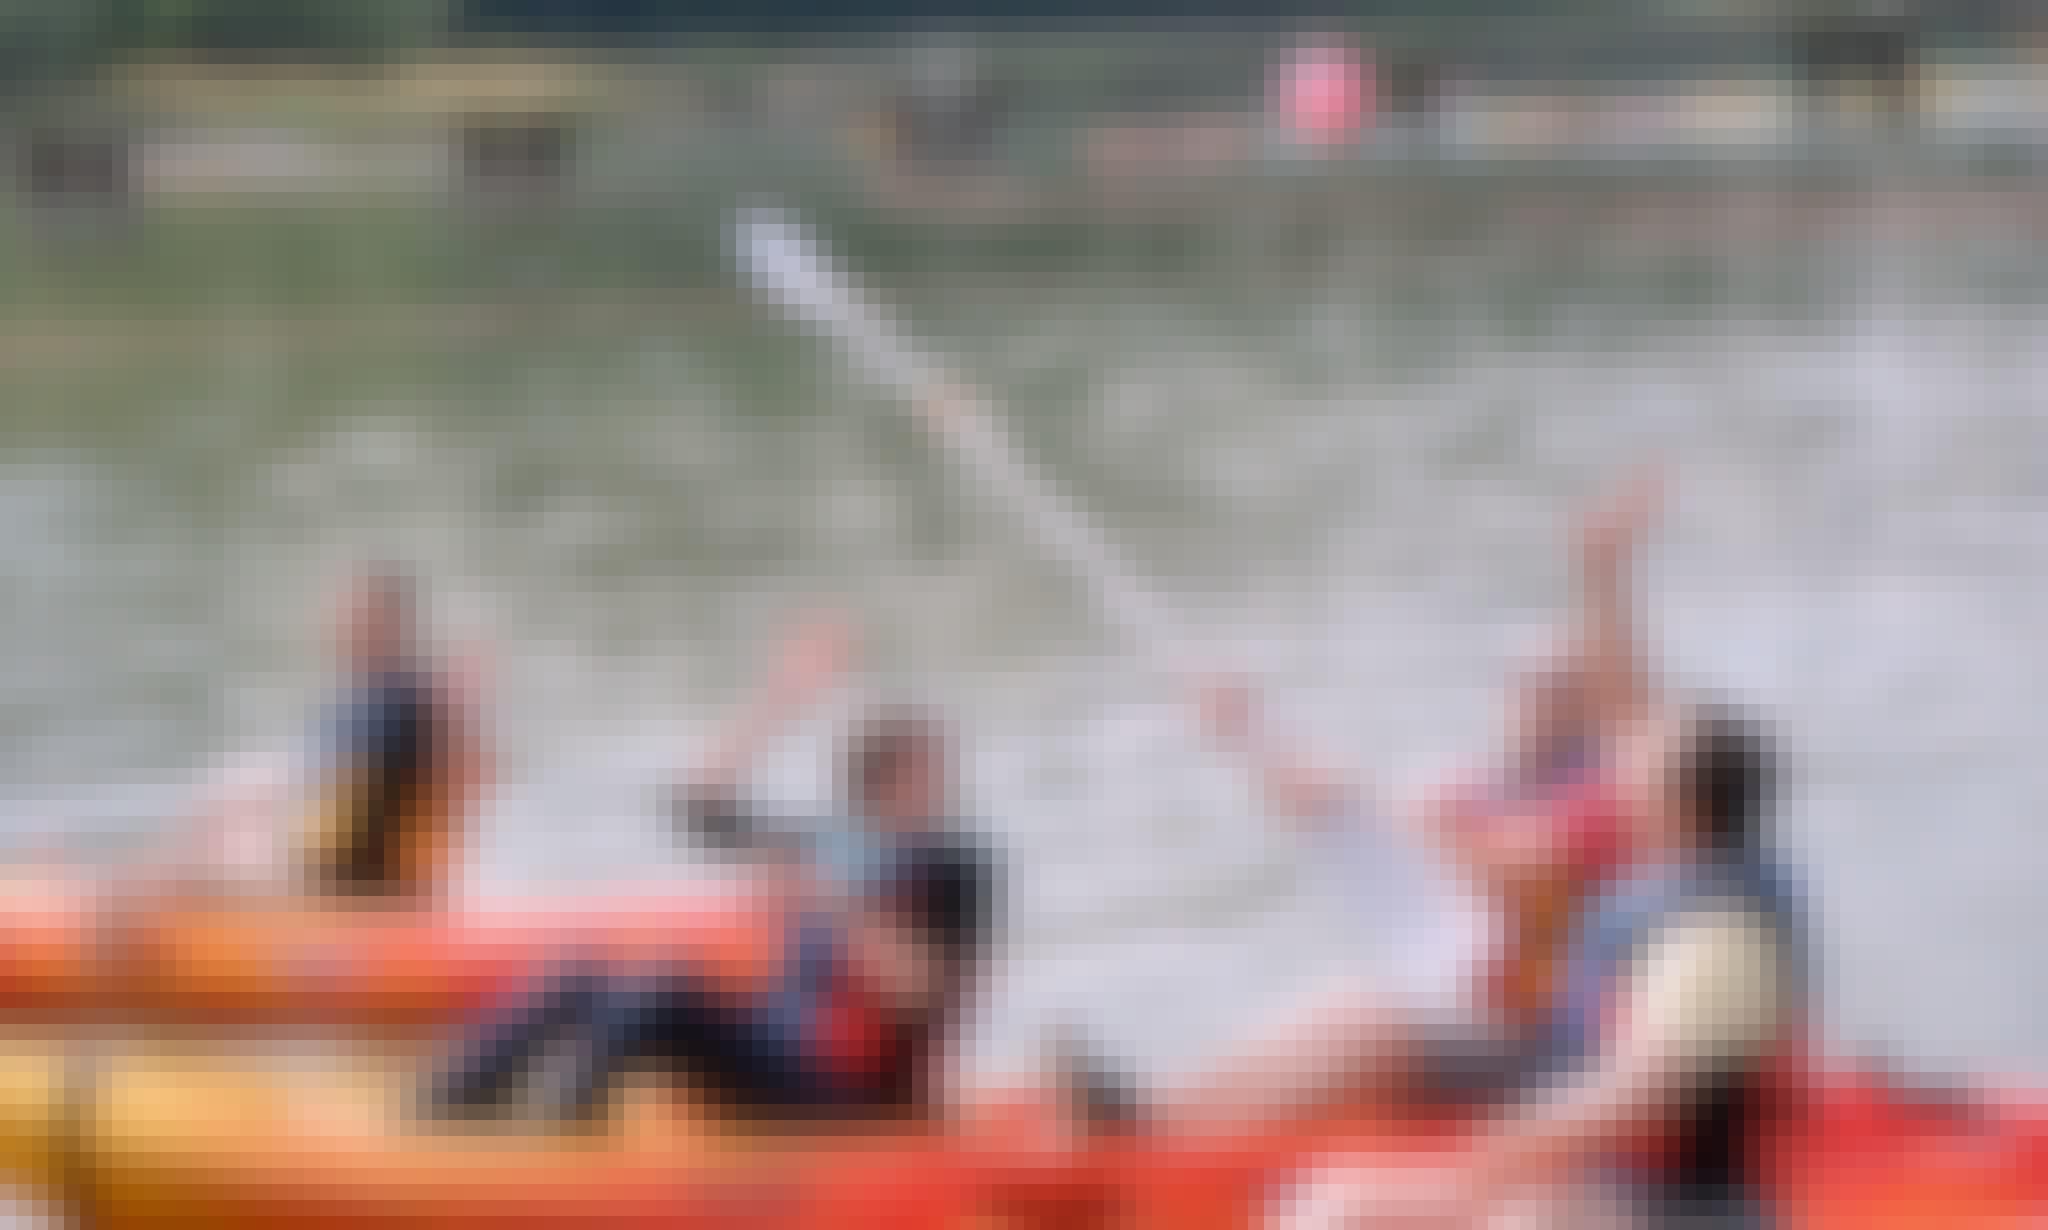 Enjoy Kayaking in Aix-les-Bains, Auvergne-Rhône-Alpes